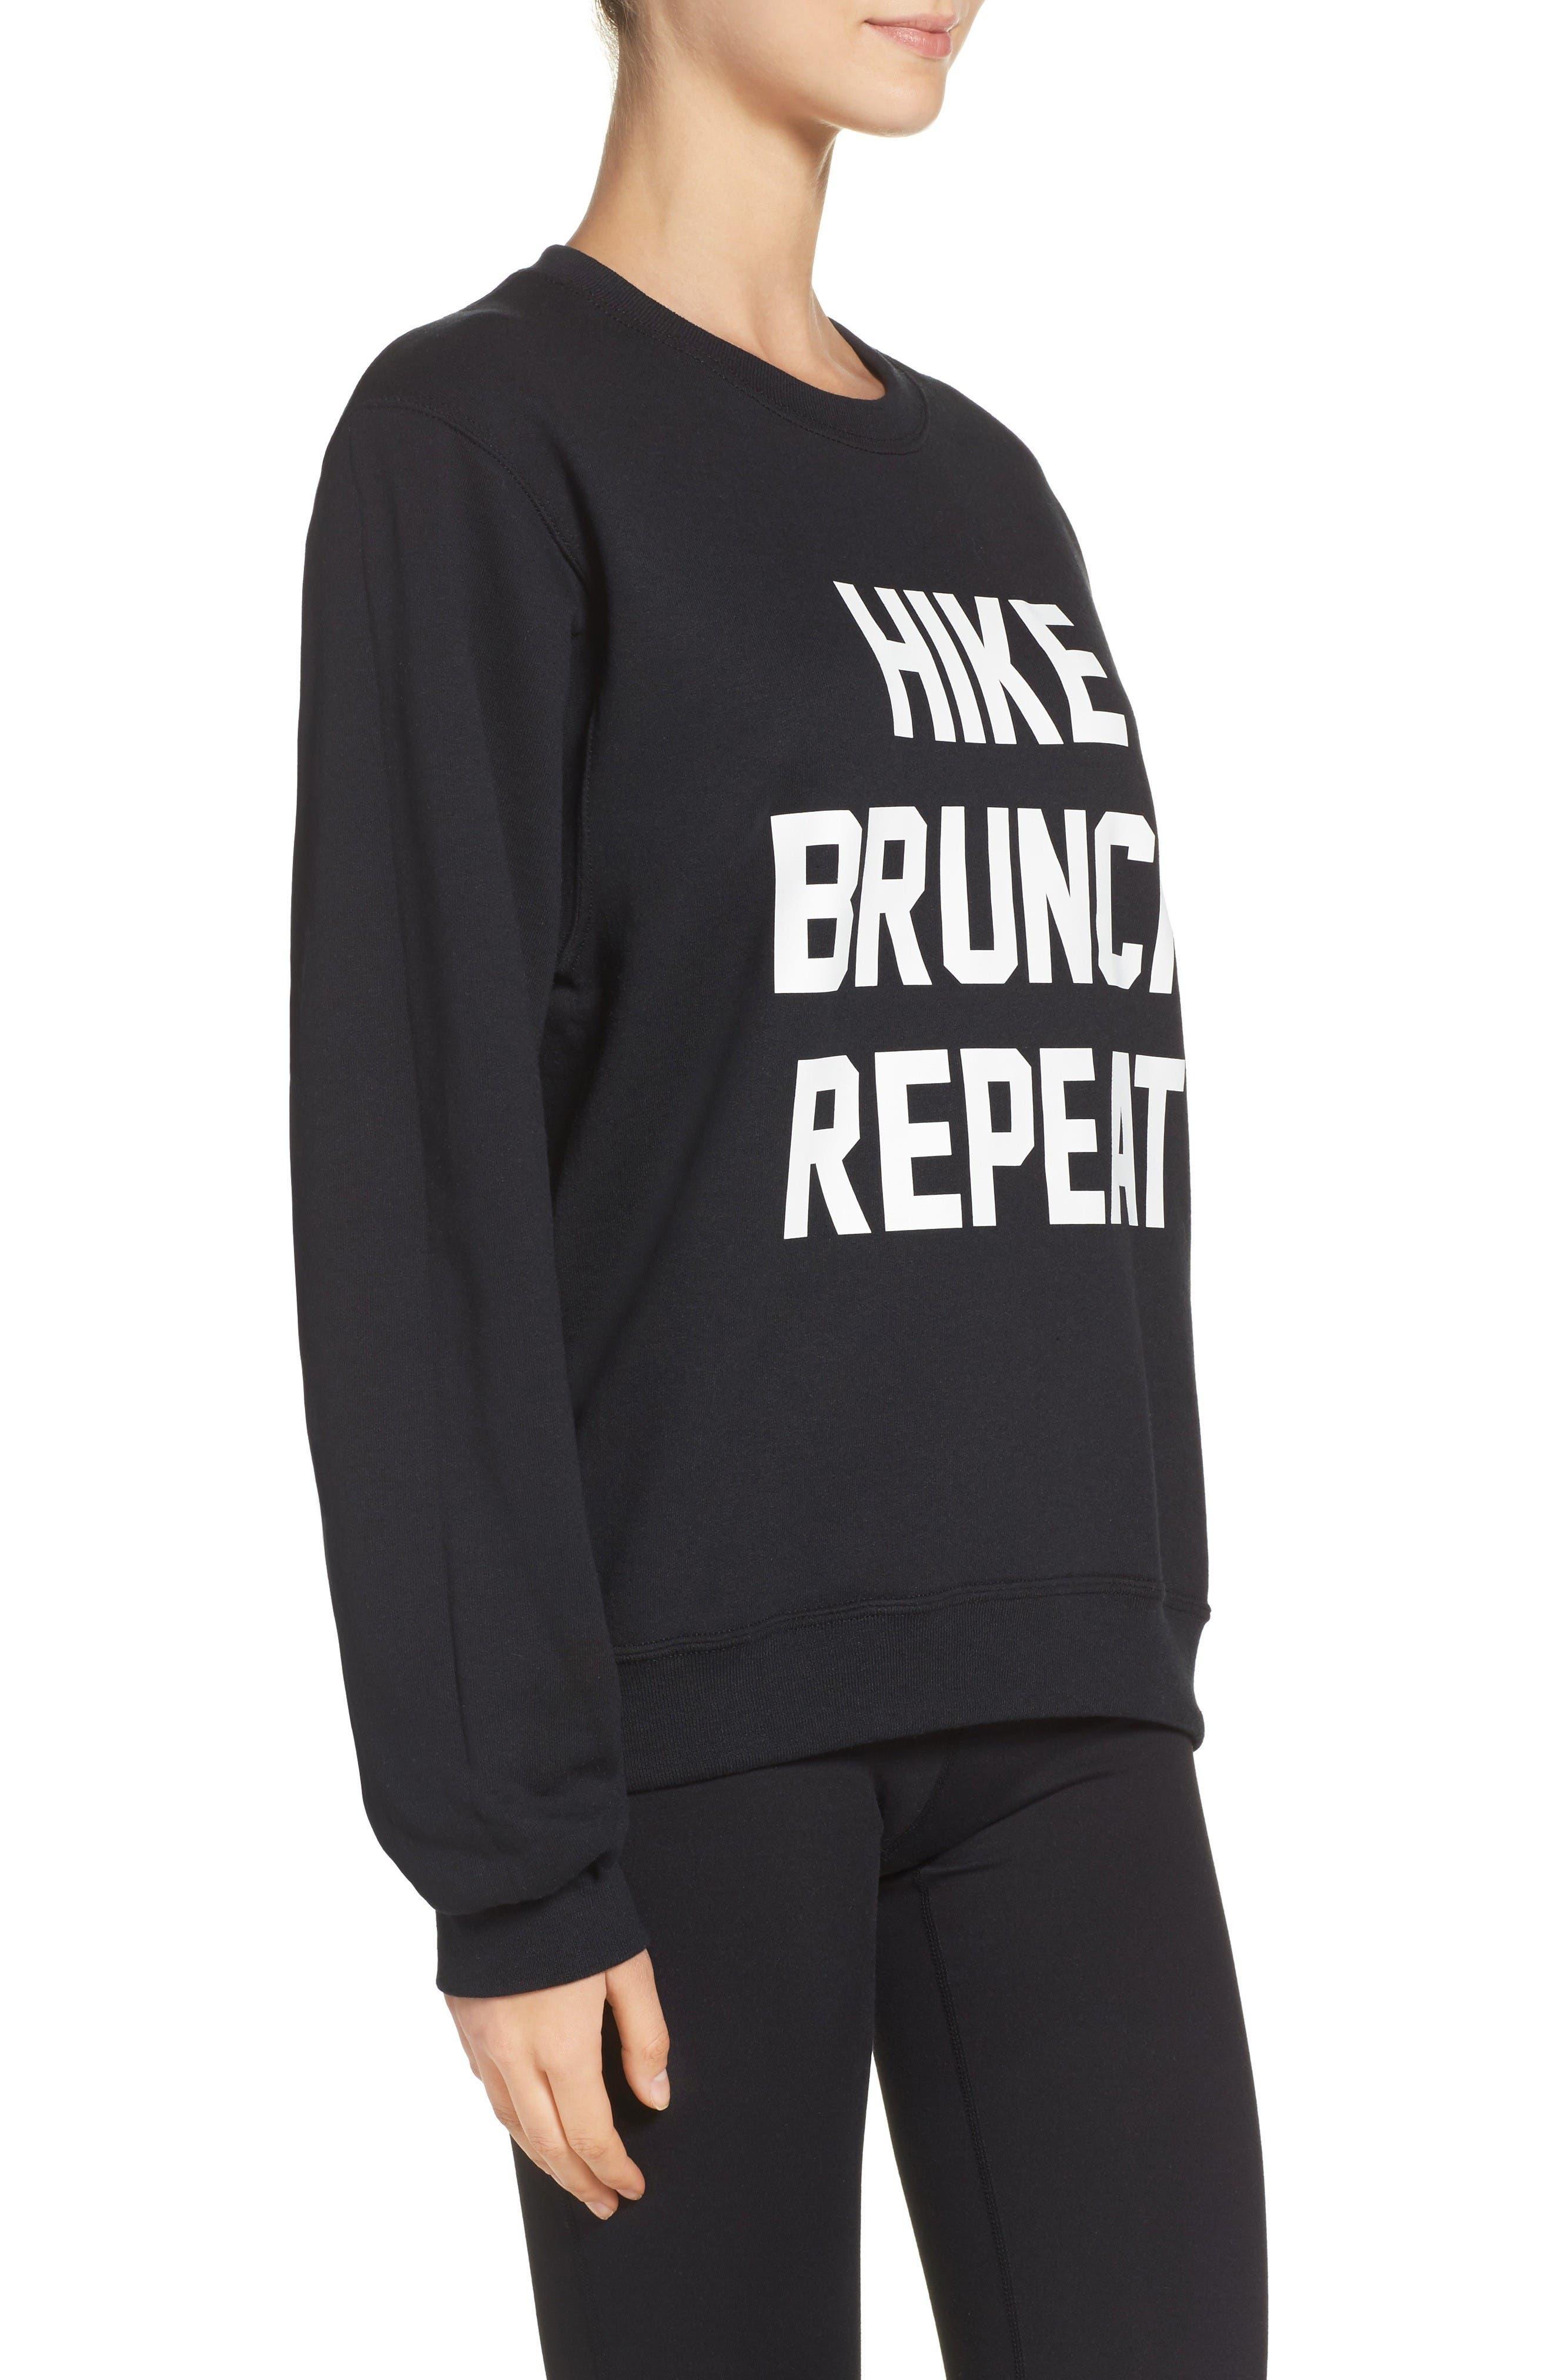 Alternate Image 3  - Private Party Hike Brunch Repeat Sweatshirt